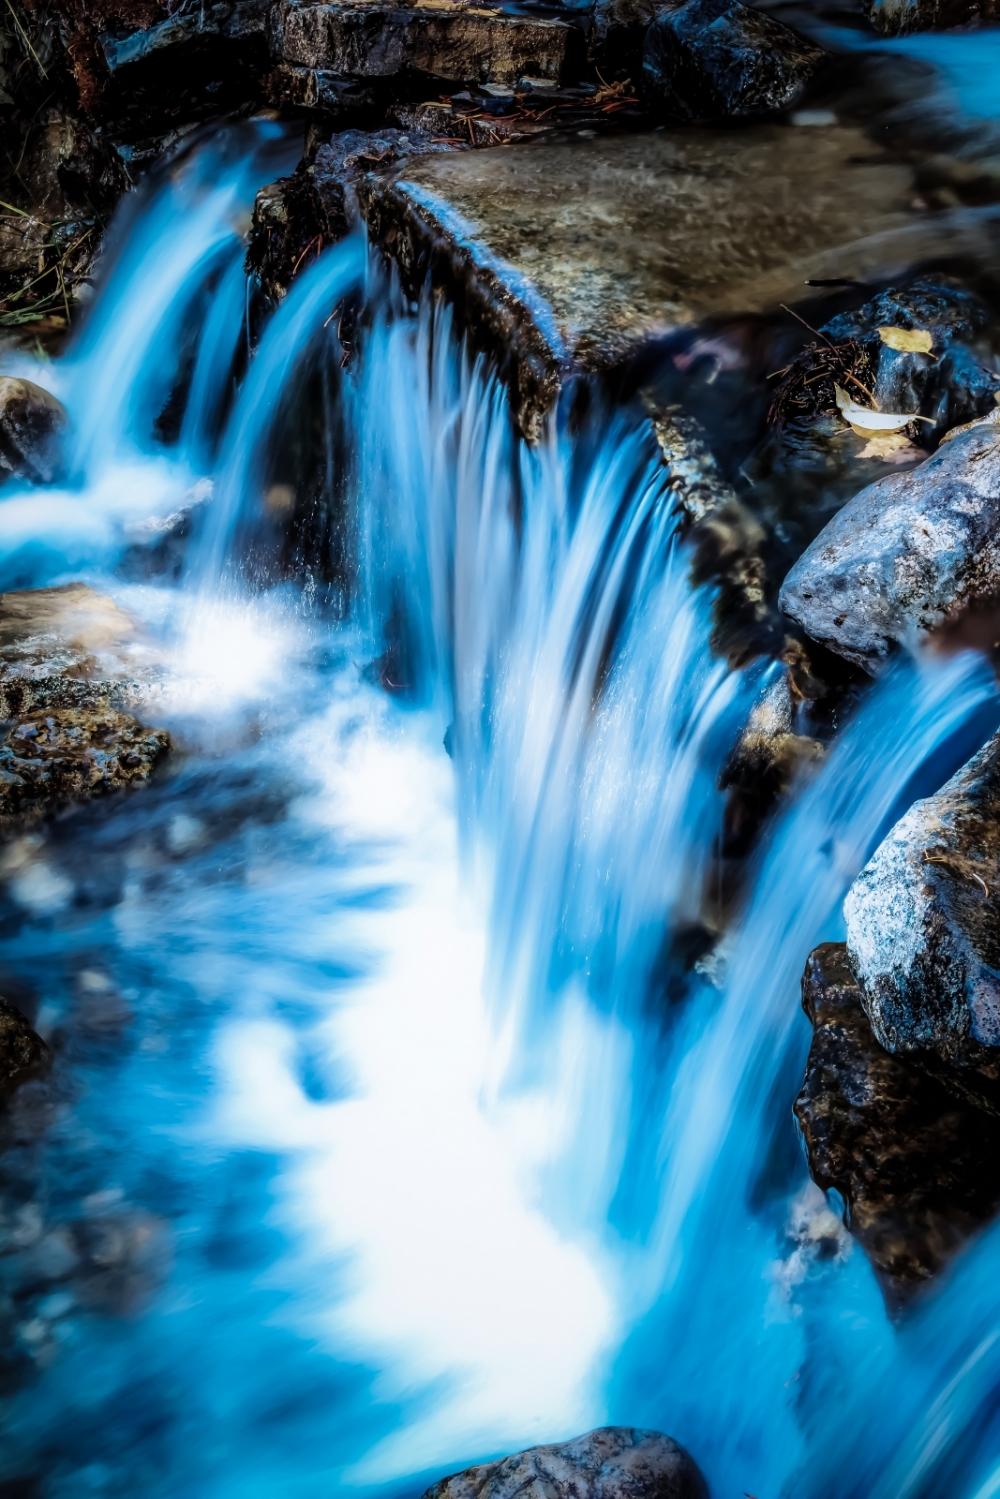 Water Lens - Kananaskis, Alberta 2